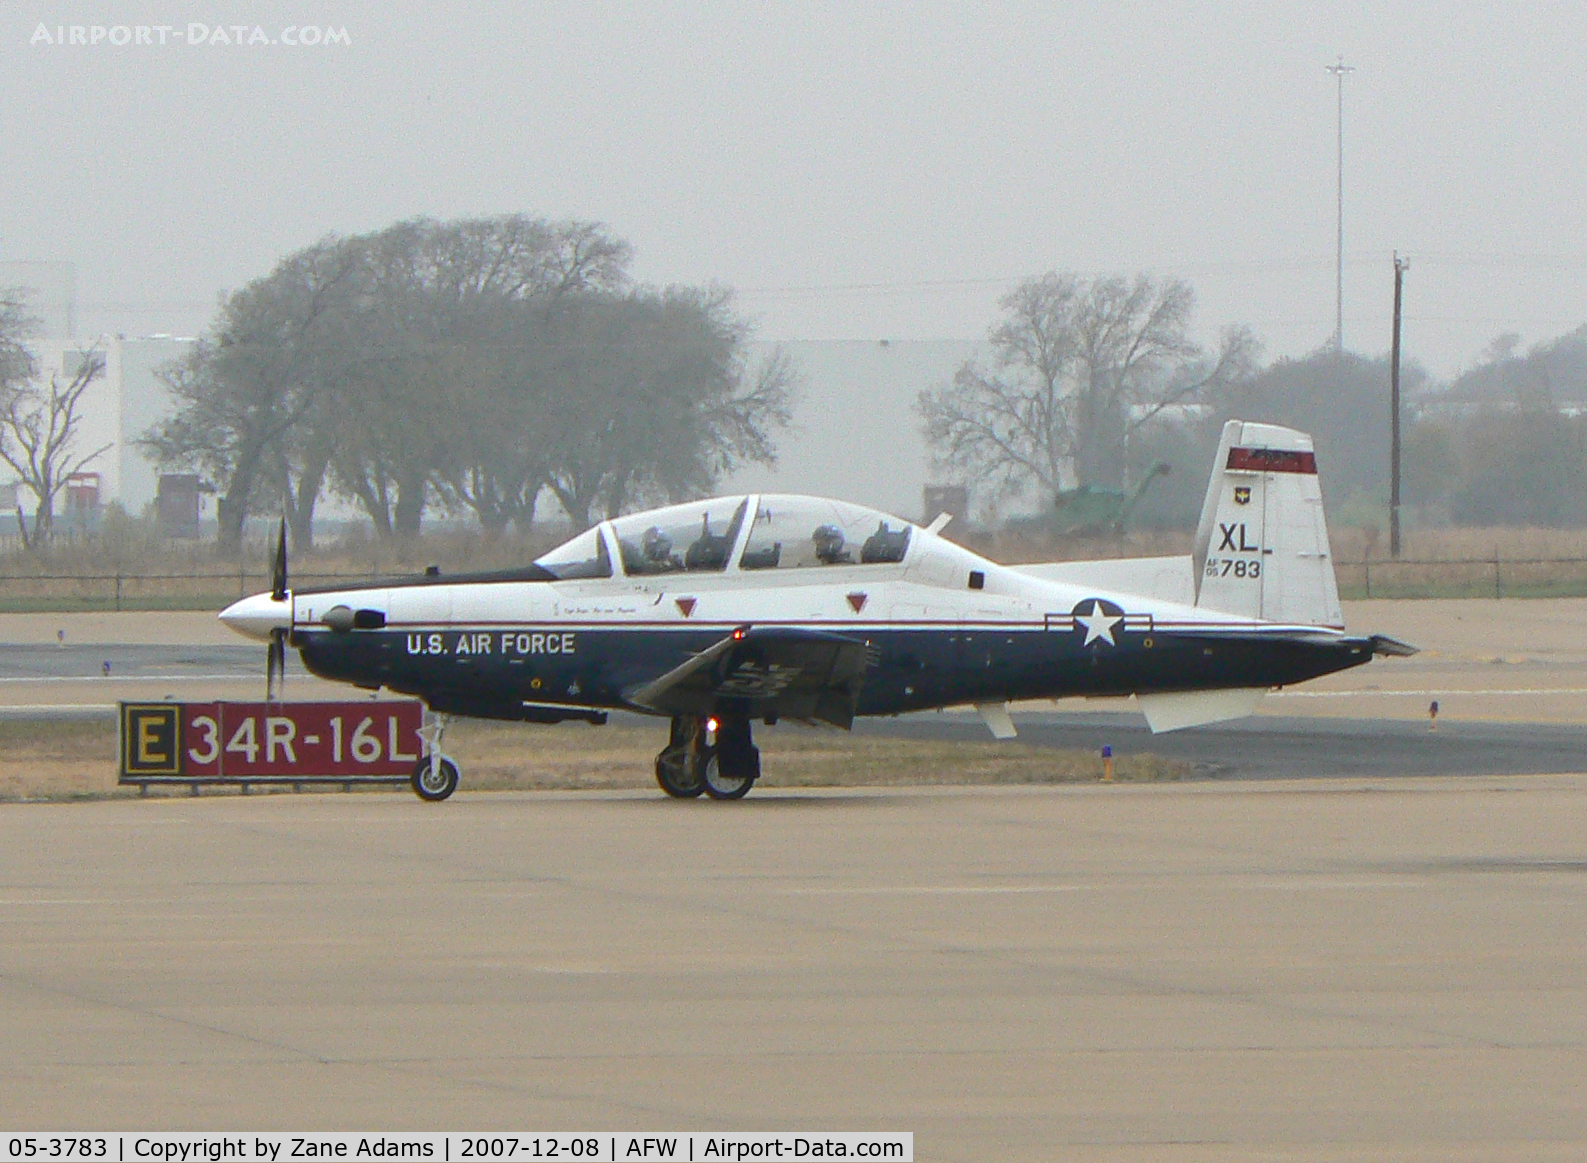 05-3783, Raytheon T-6A Texan II C/N PT-335, On the ramp at Alliance Ft. Worth